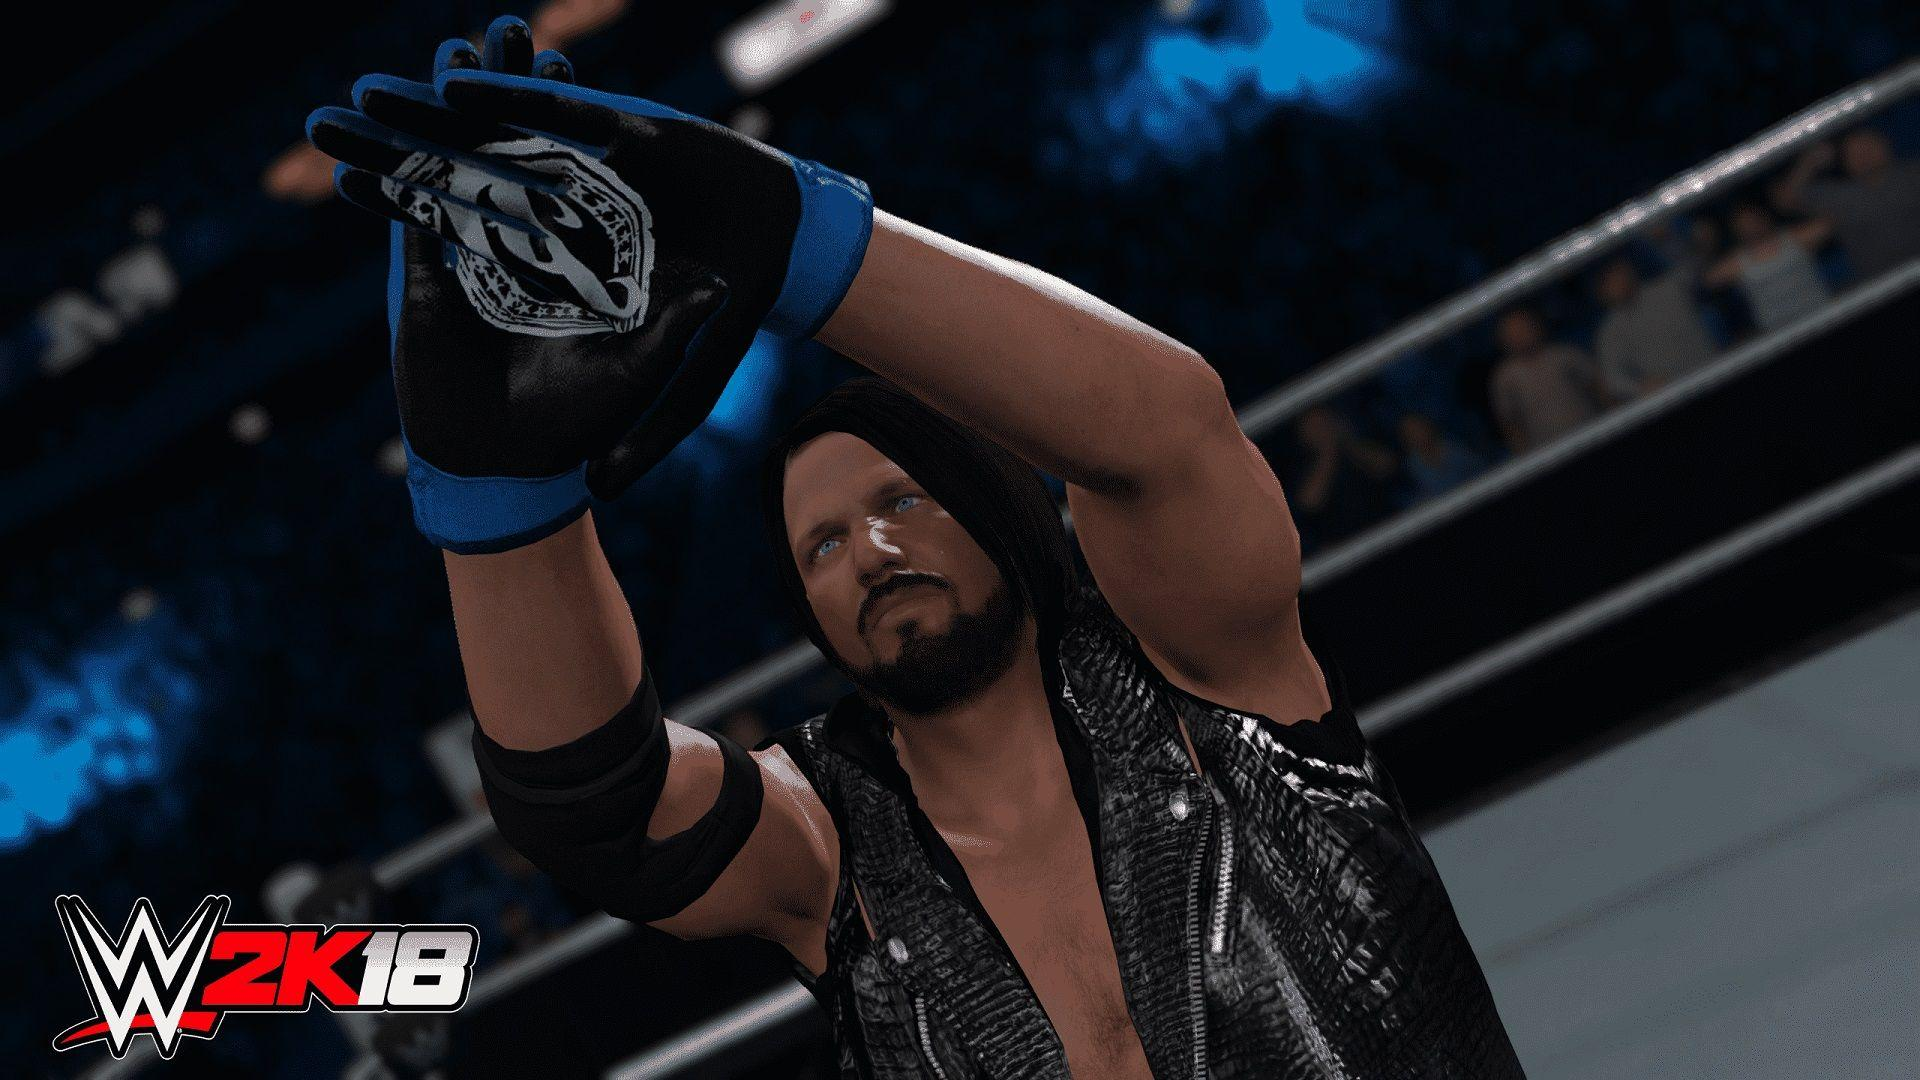 WWE 2K18 Wallpapers - Wallpaper Cave